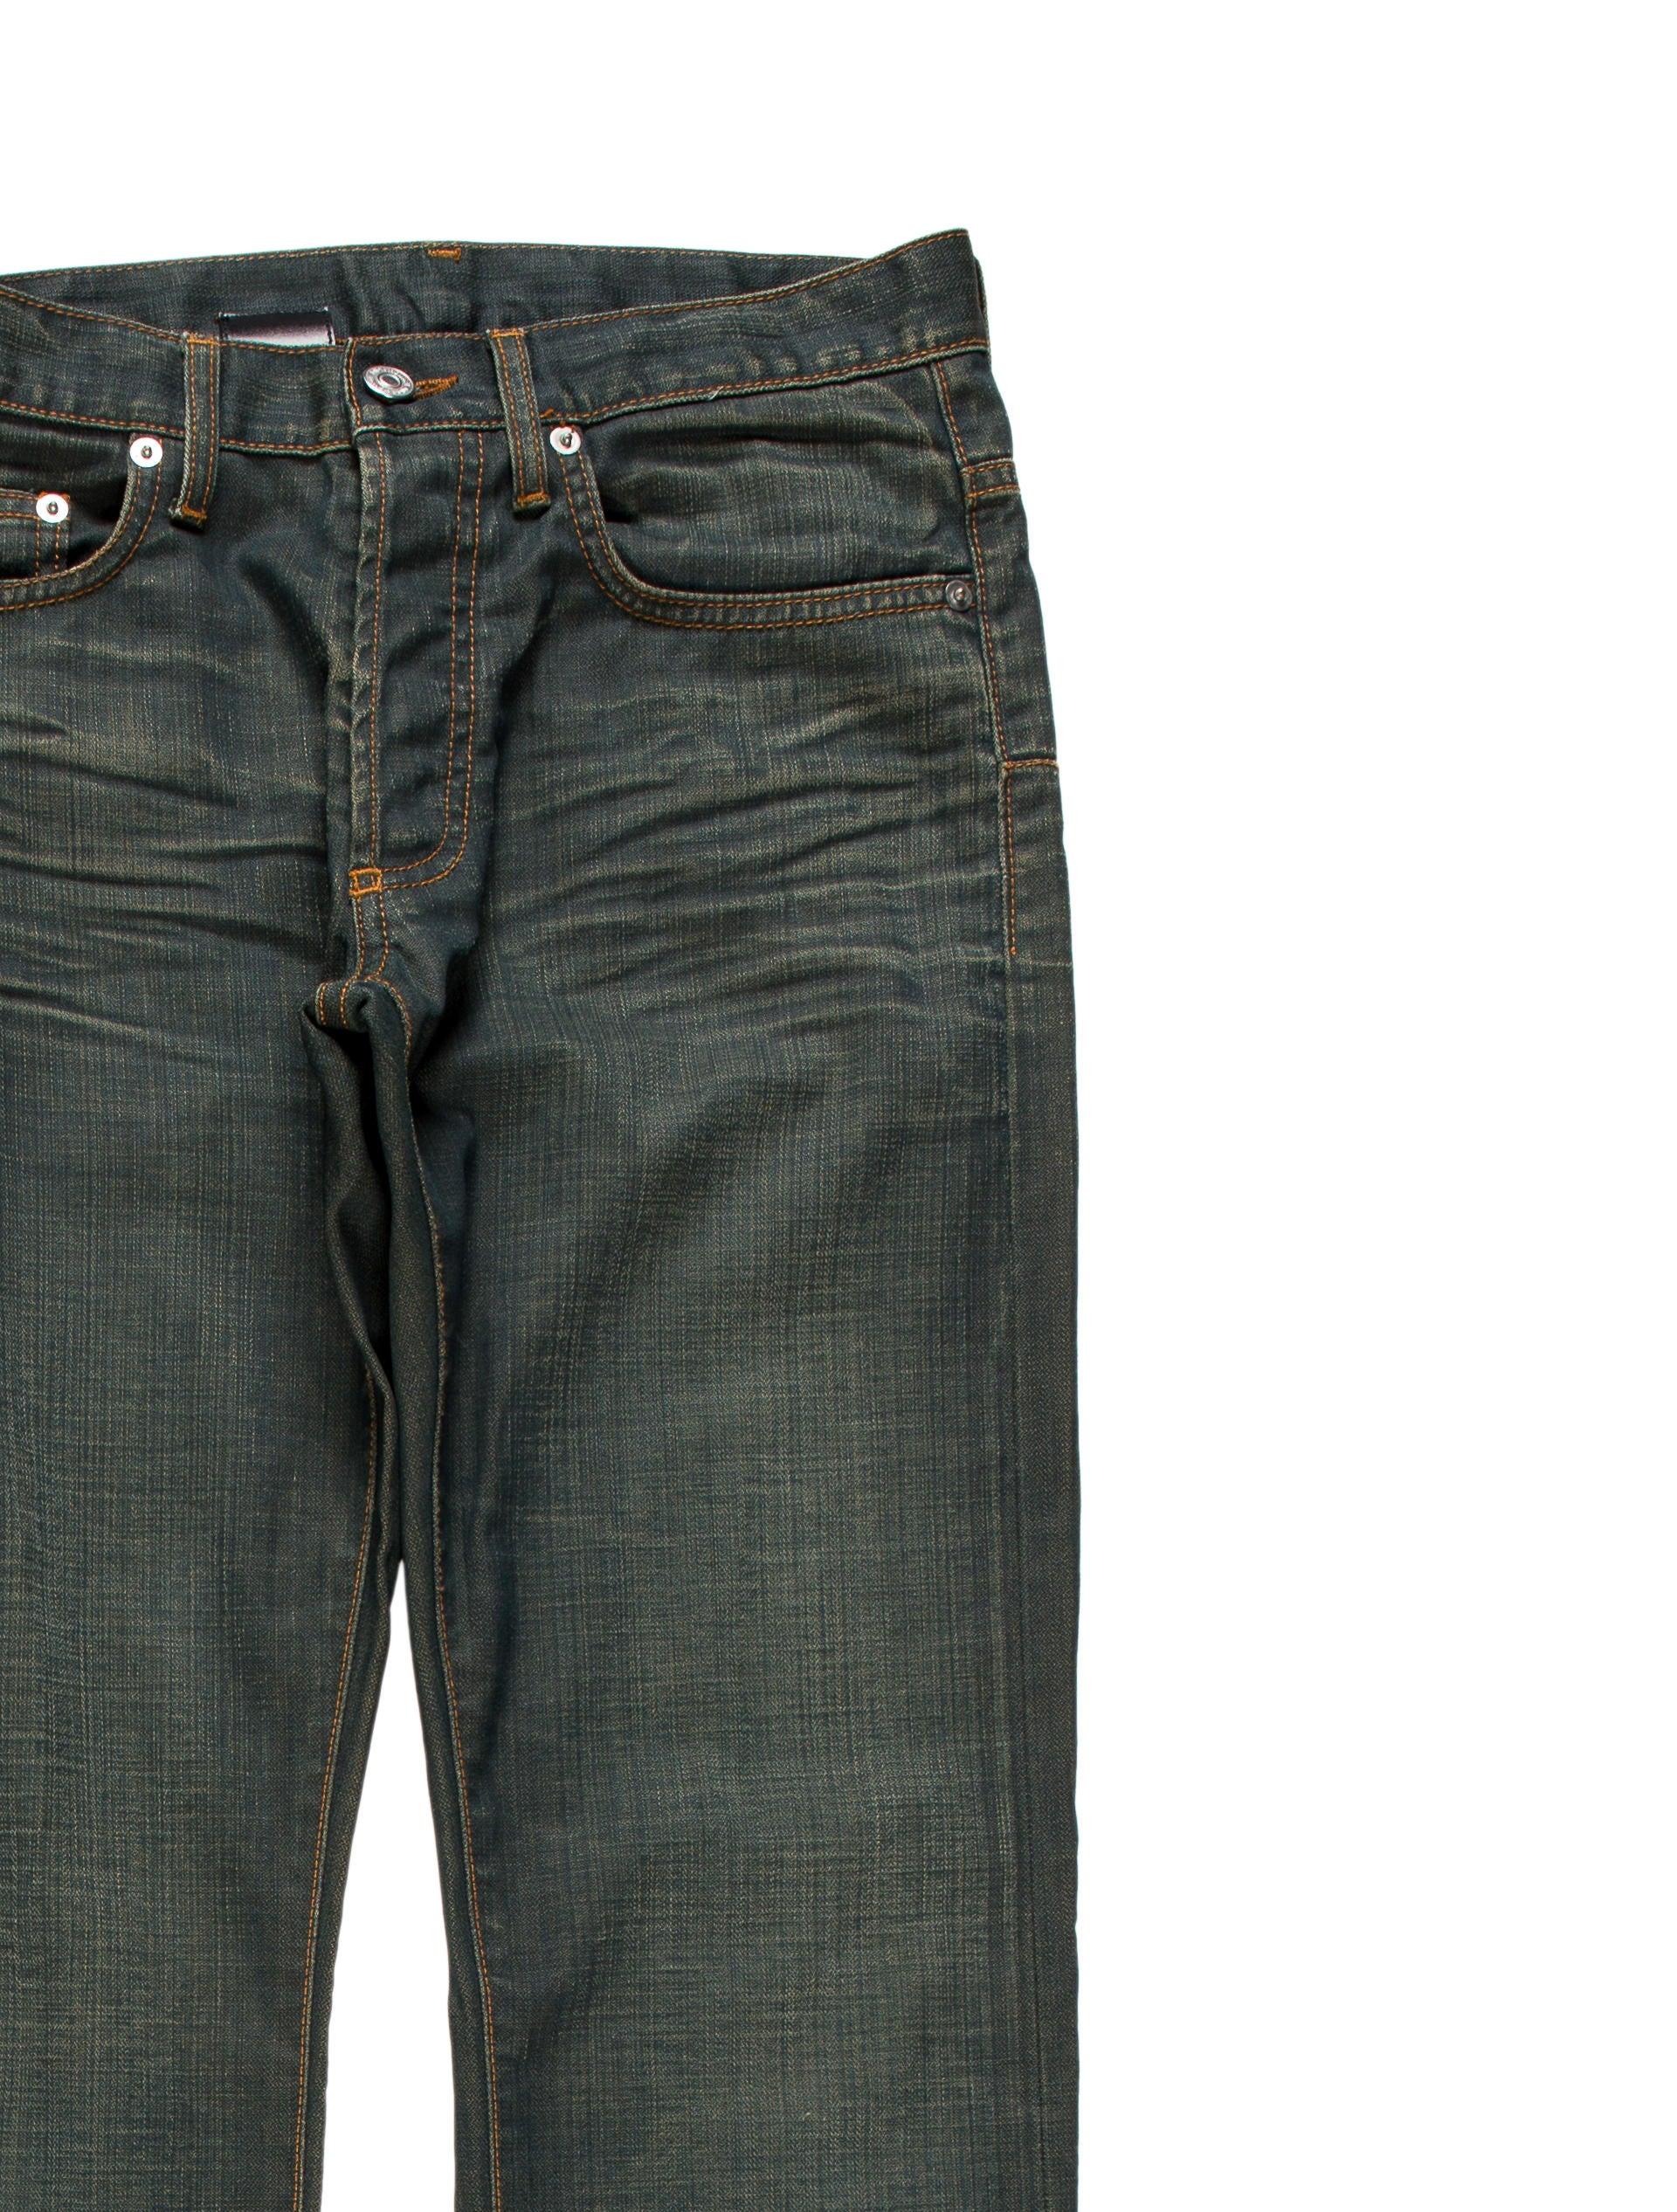 dior homme wax coated slim jeans clothing hmm23154. Black Bedroom Furniture Sets. Home Design Ideas